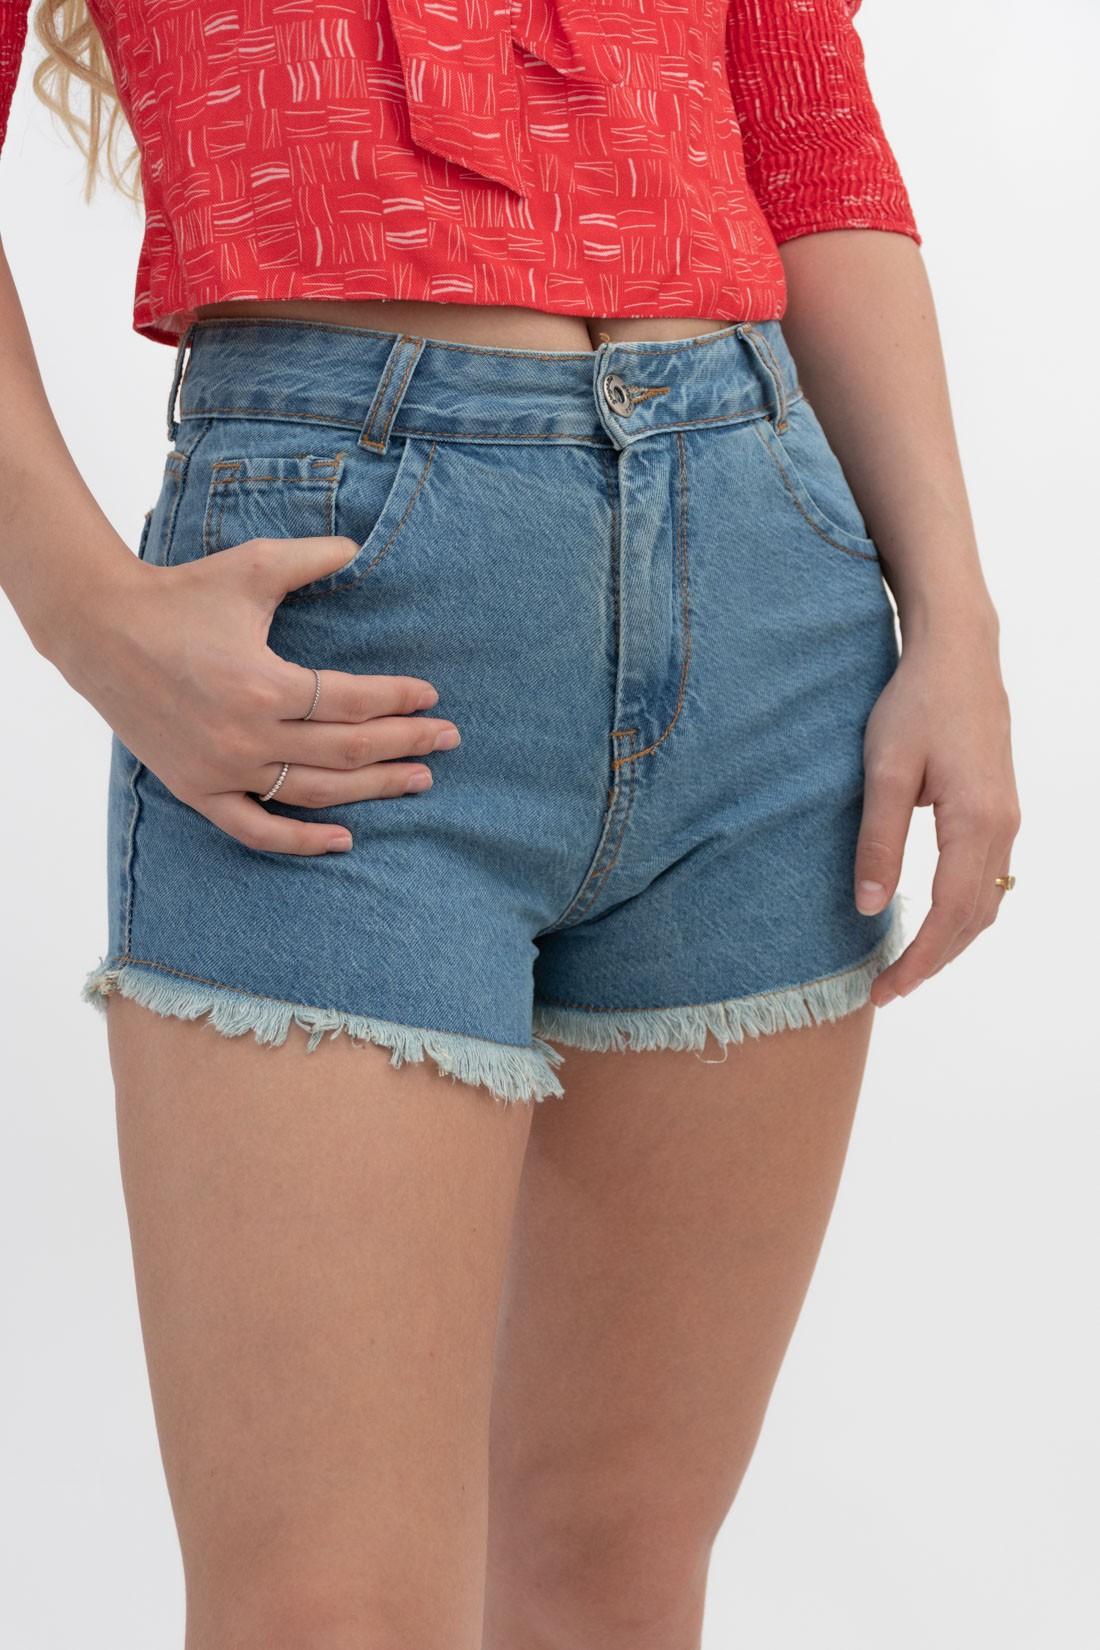 Shorts Jeans Hotpant Desfiado